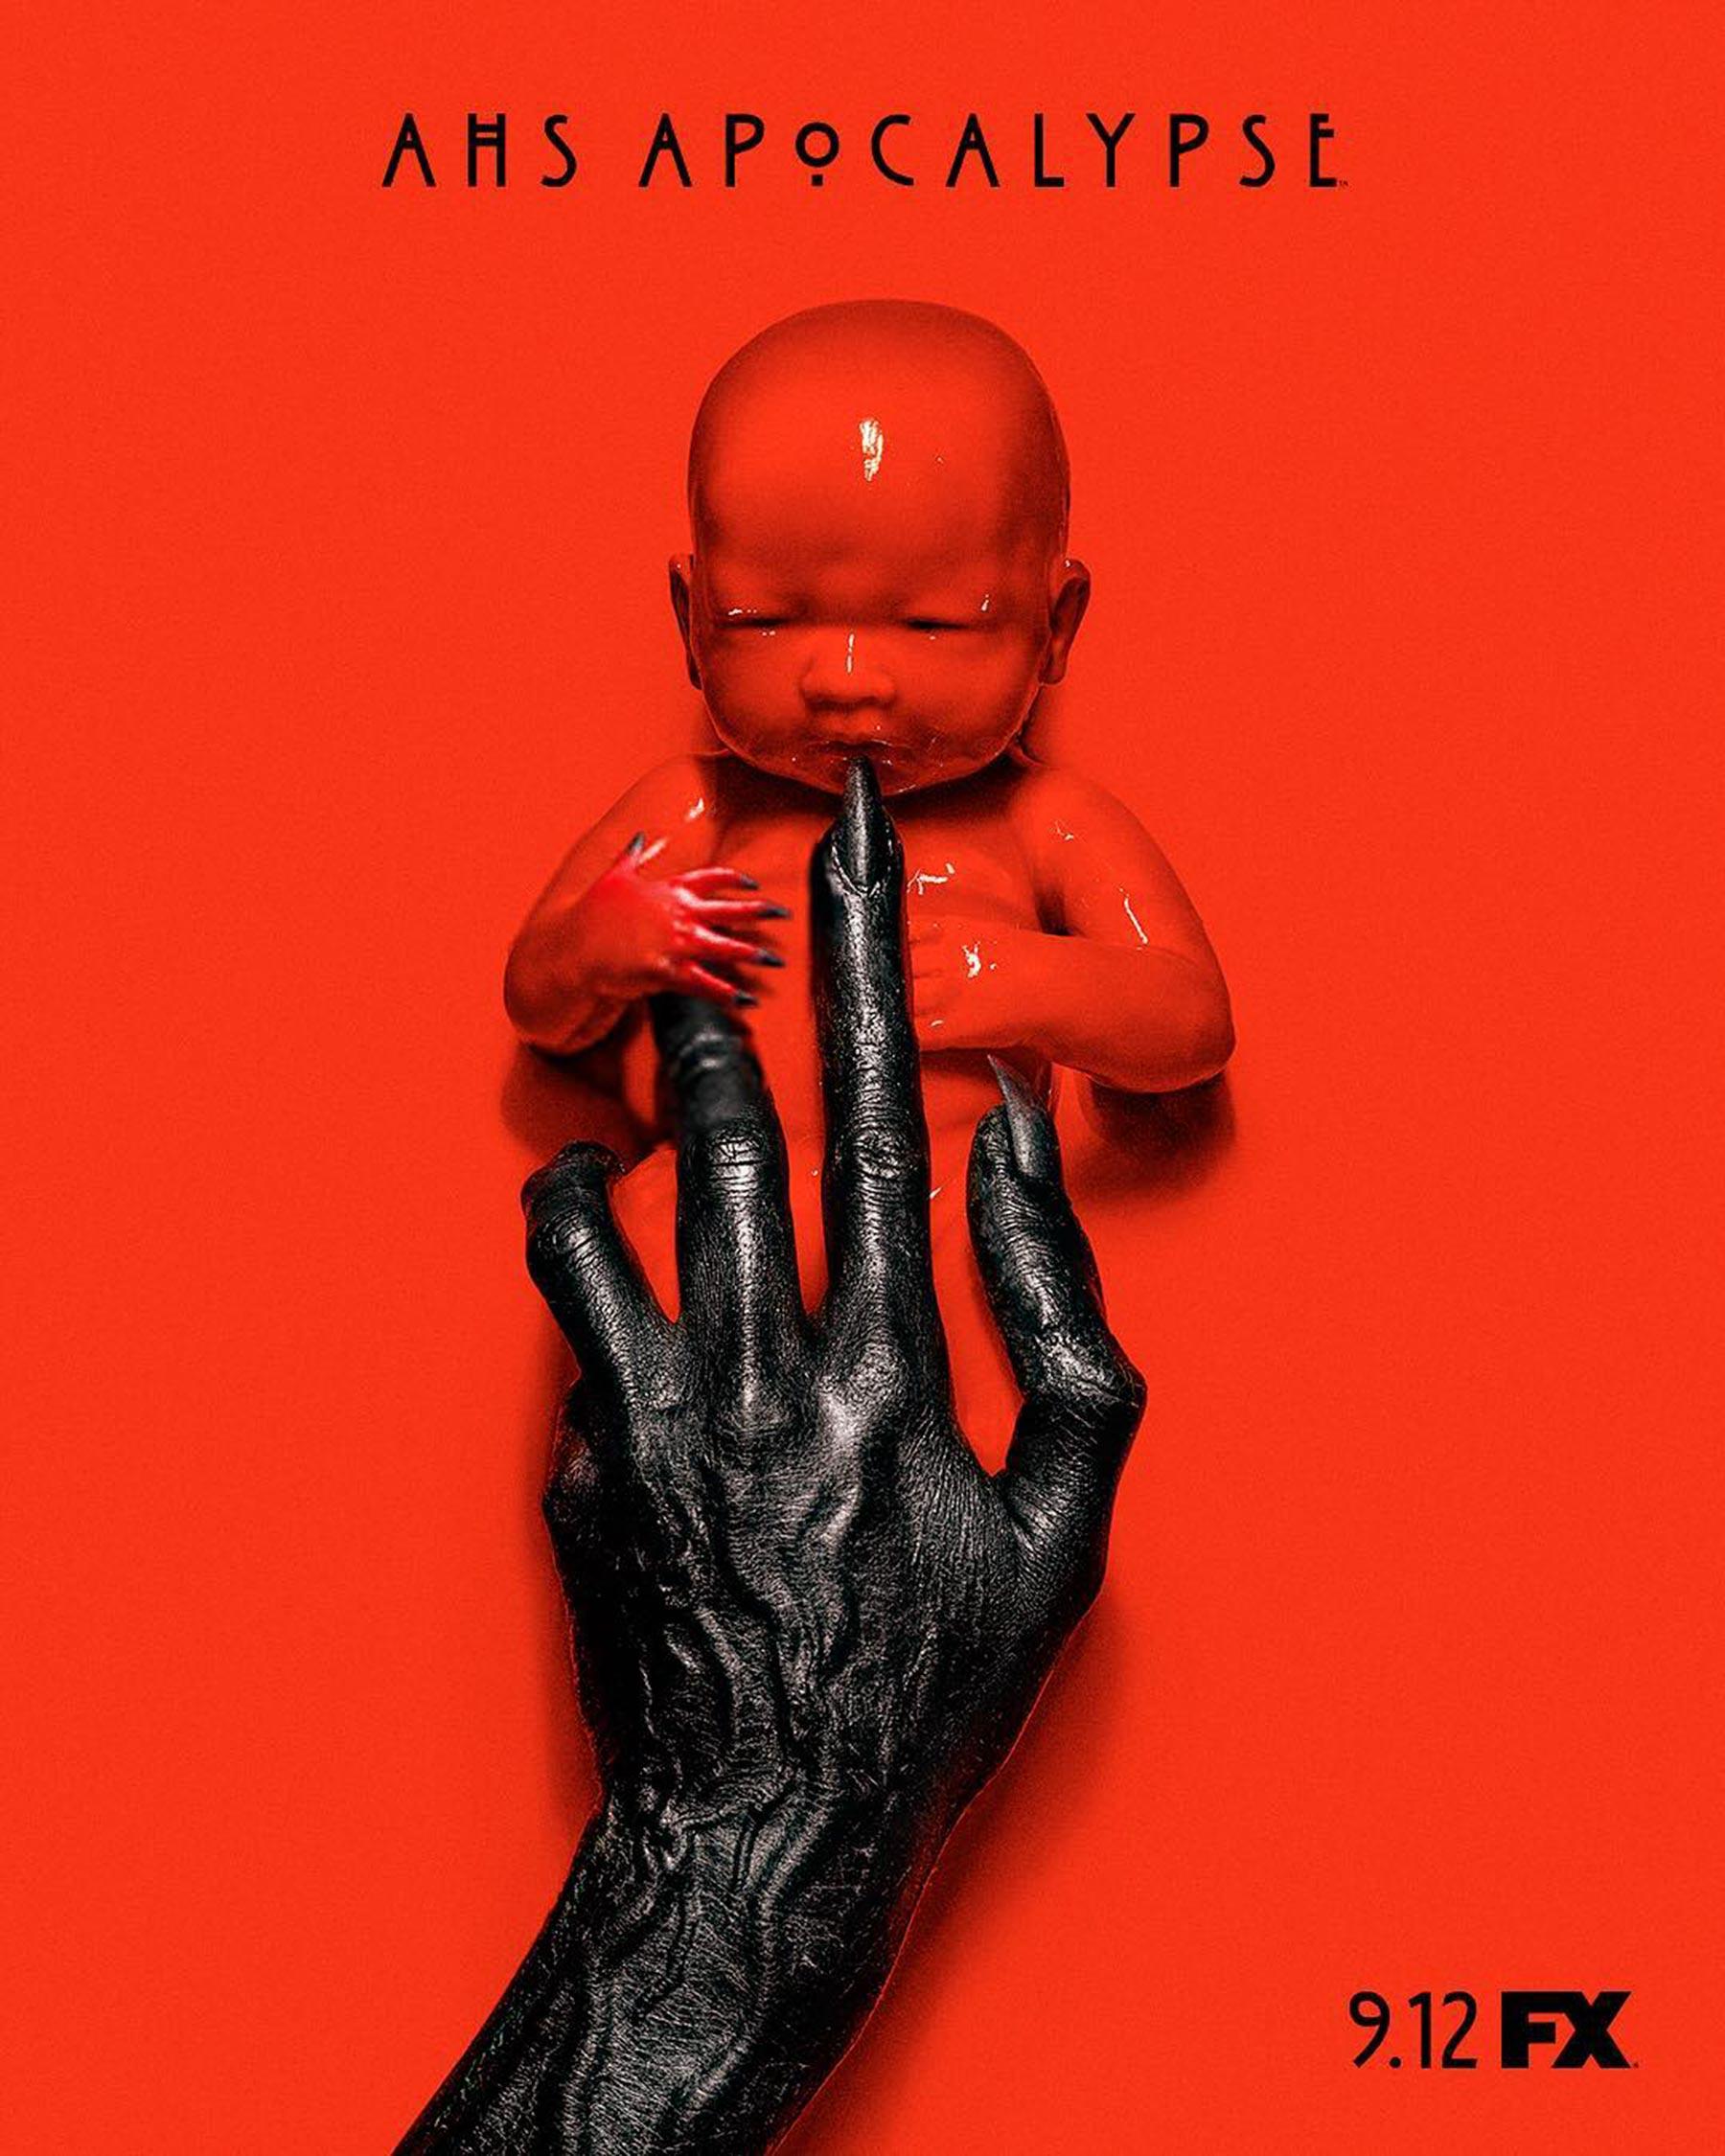 Nouvelle bande-annonce pour American Horror Story 8